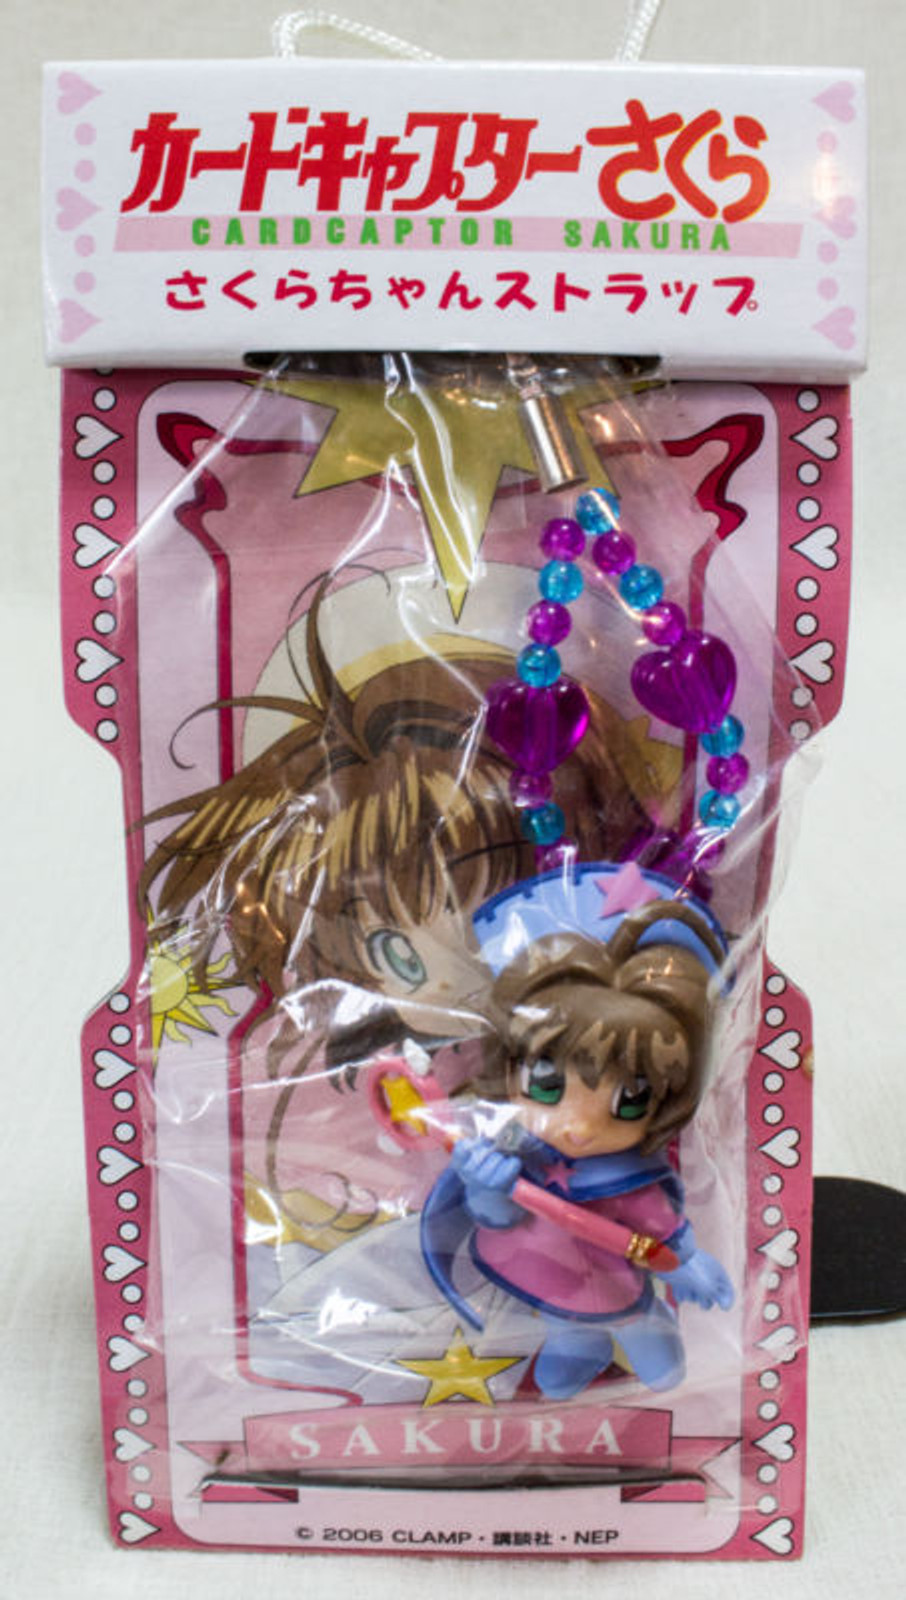 RARE! Cardcaptor Sakura Mascot Figure Mobile Strap 2 CLAMP SEGA JAPAN ANIME